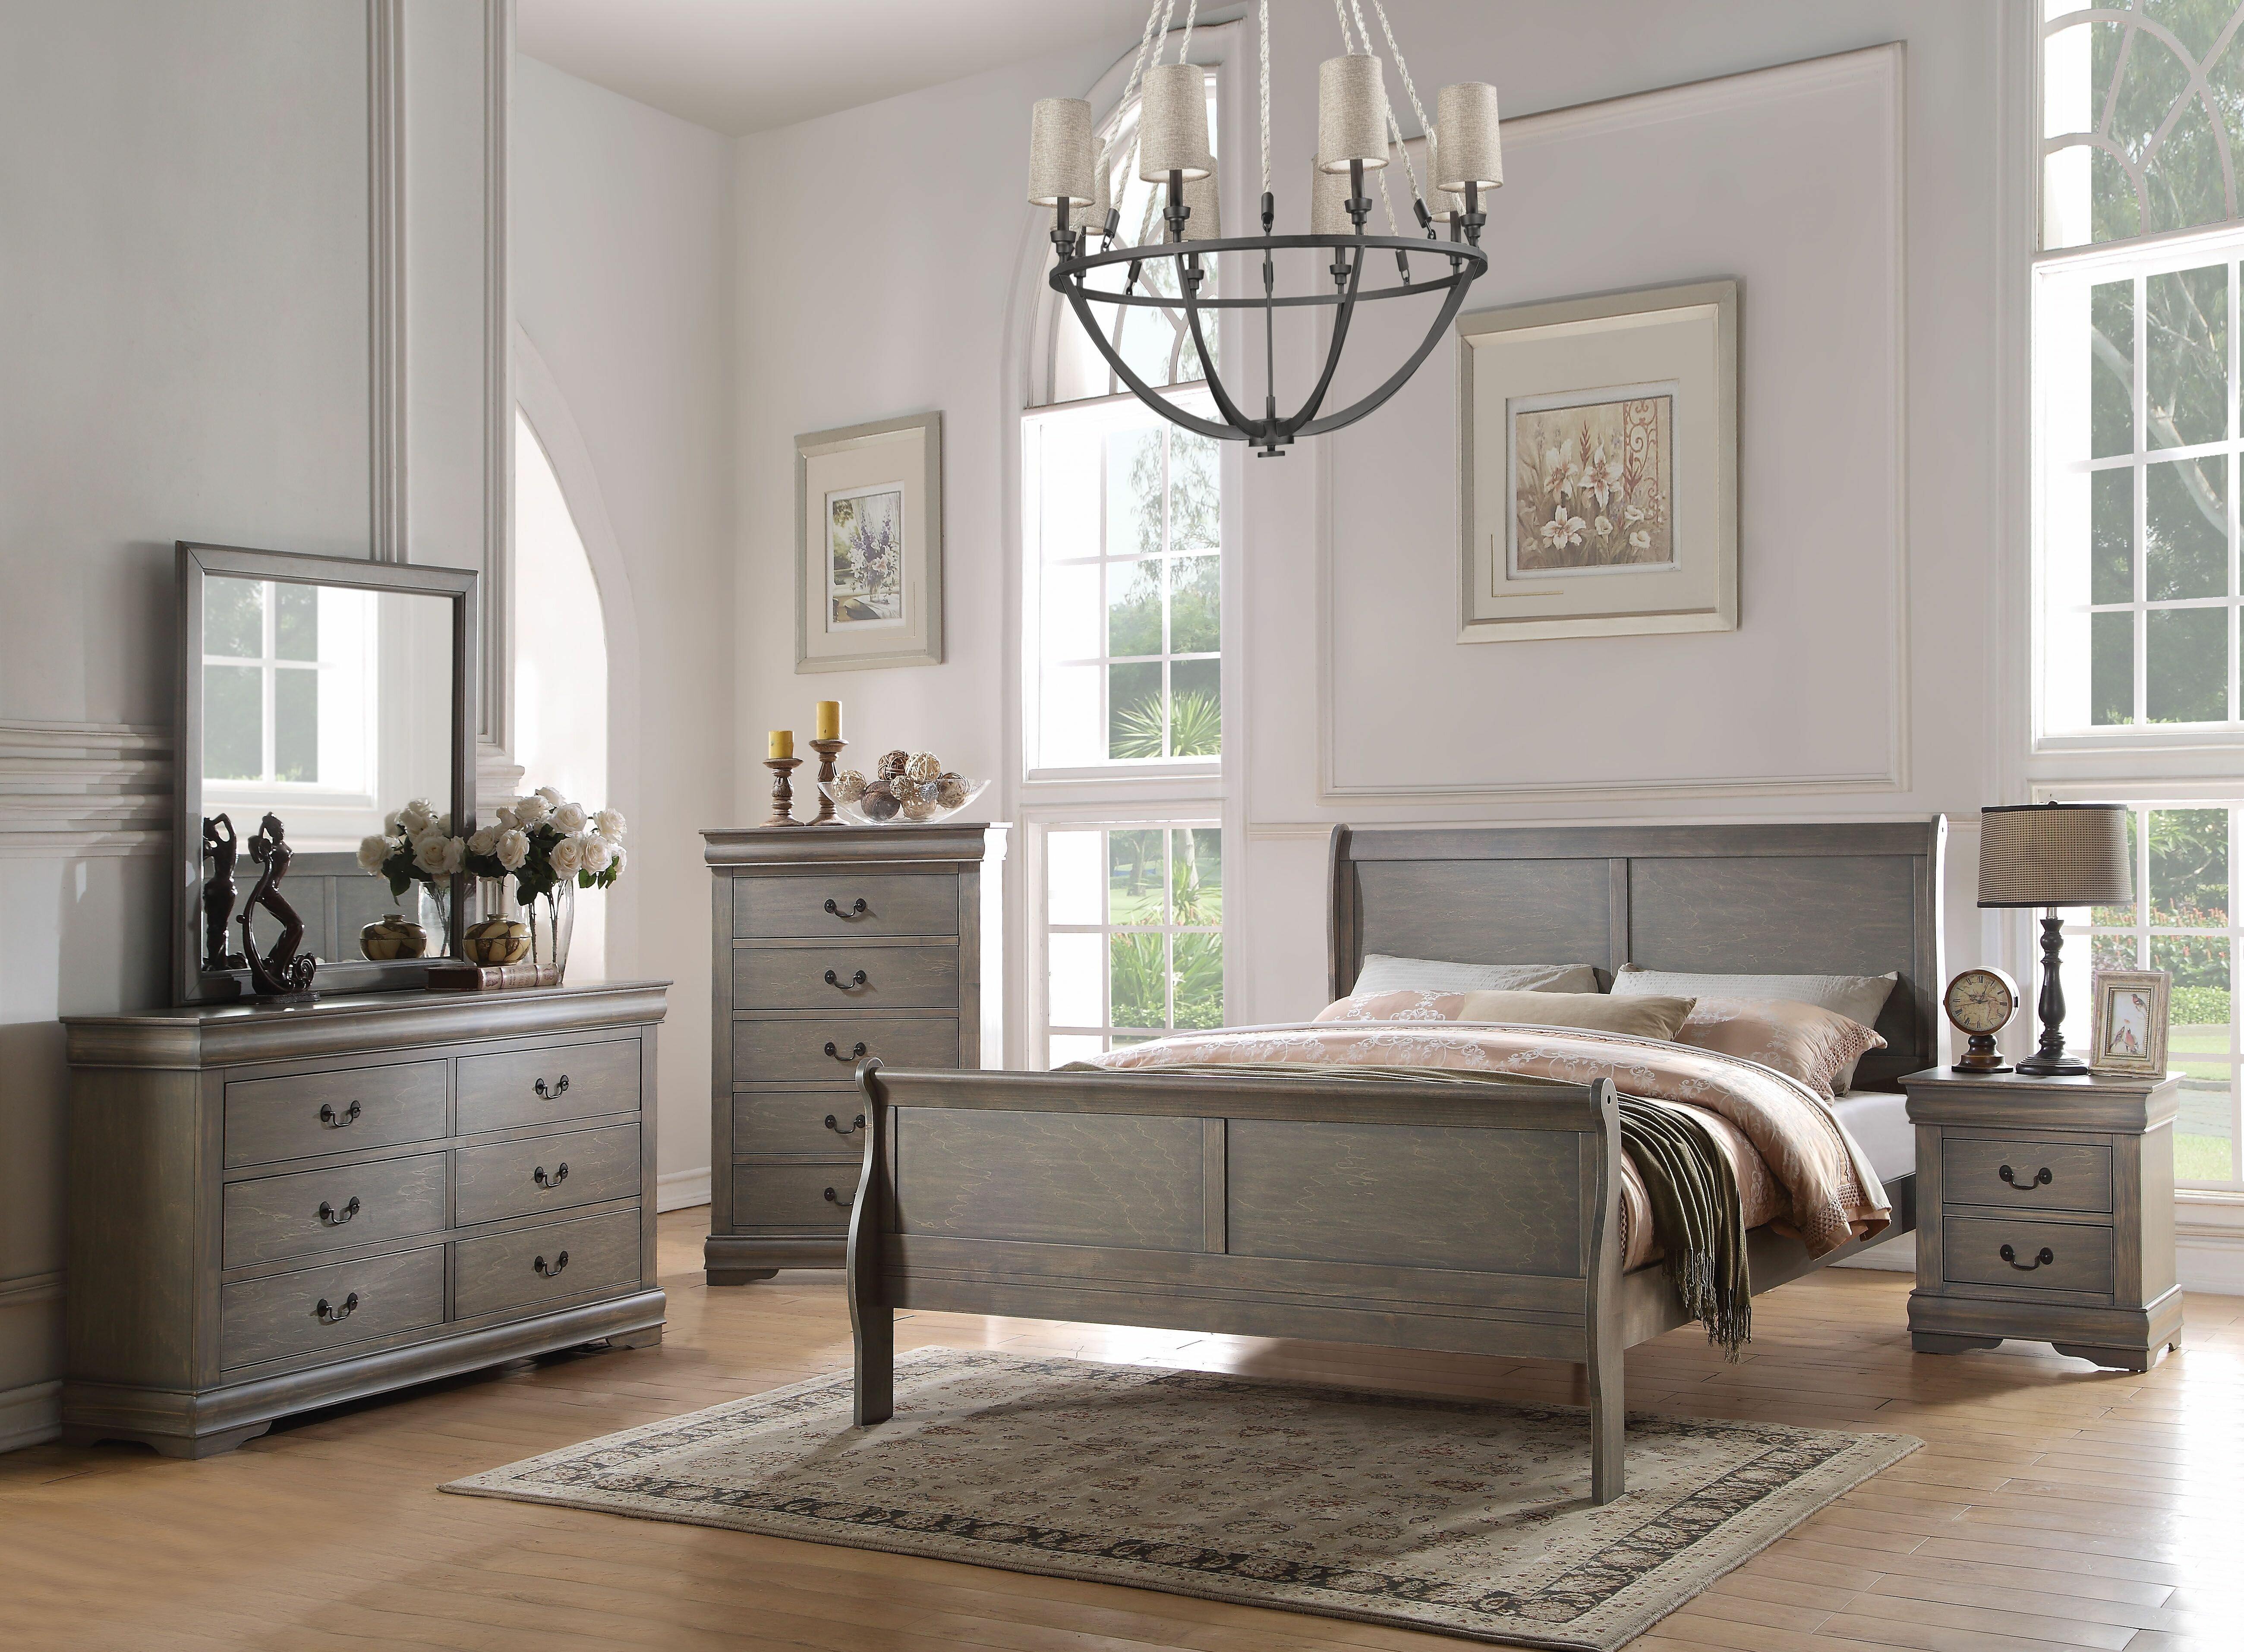 Darby Home Co Elim Sleigh 2 Piece Bedroom Set Reviews Wayfair